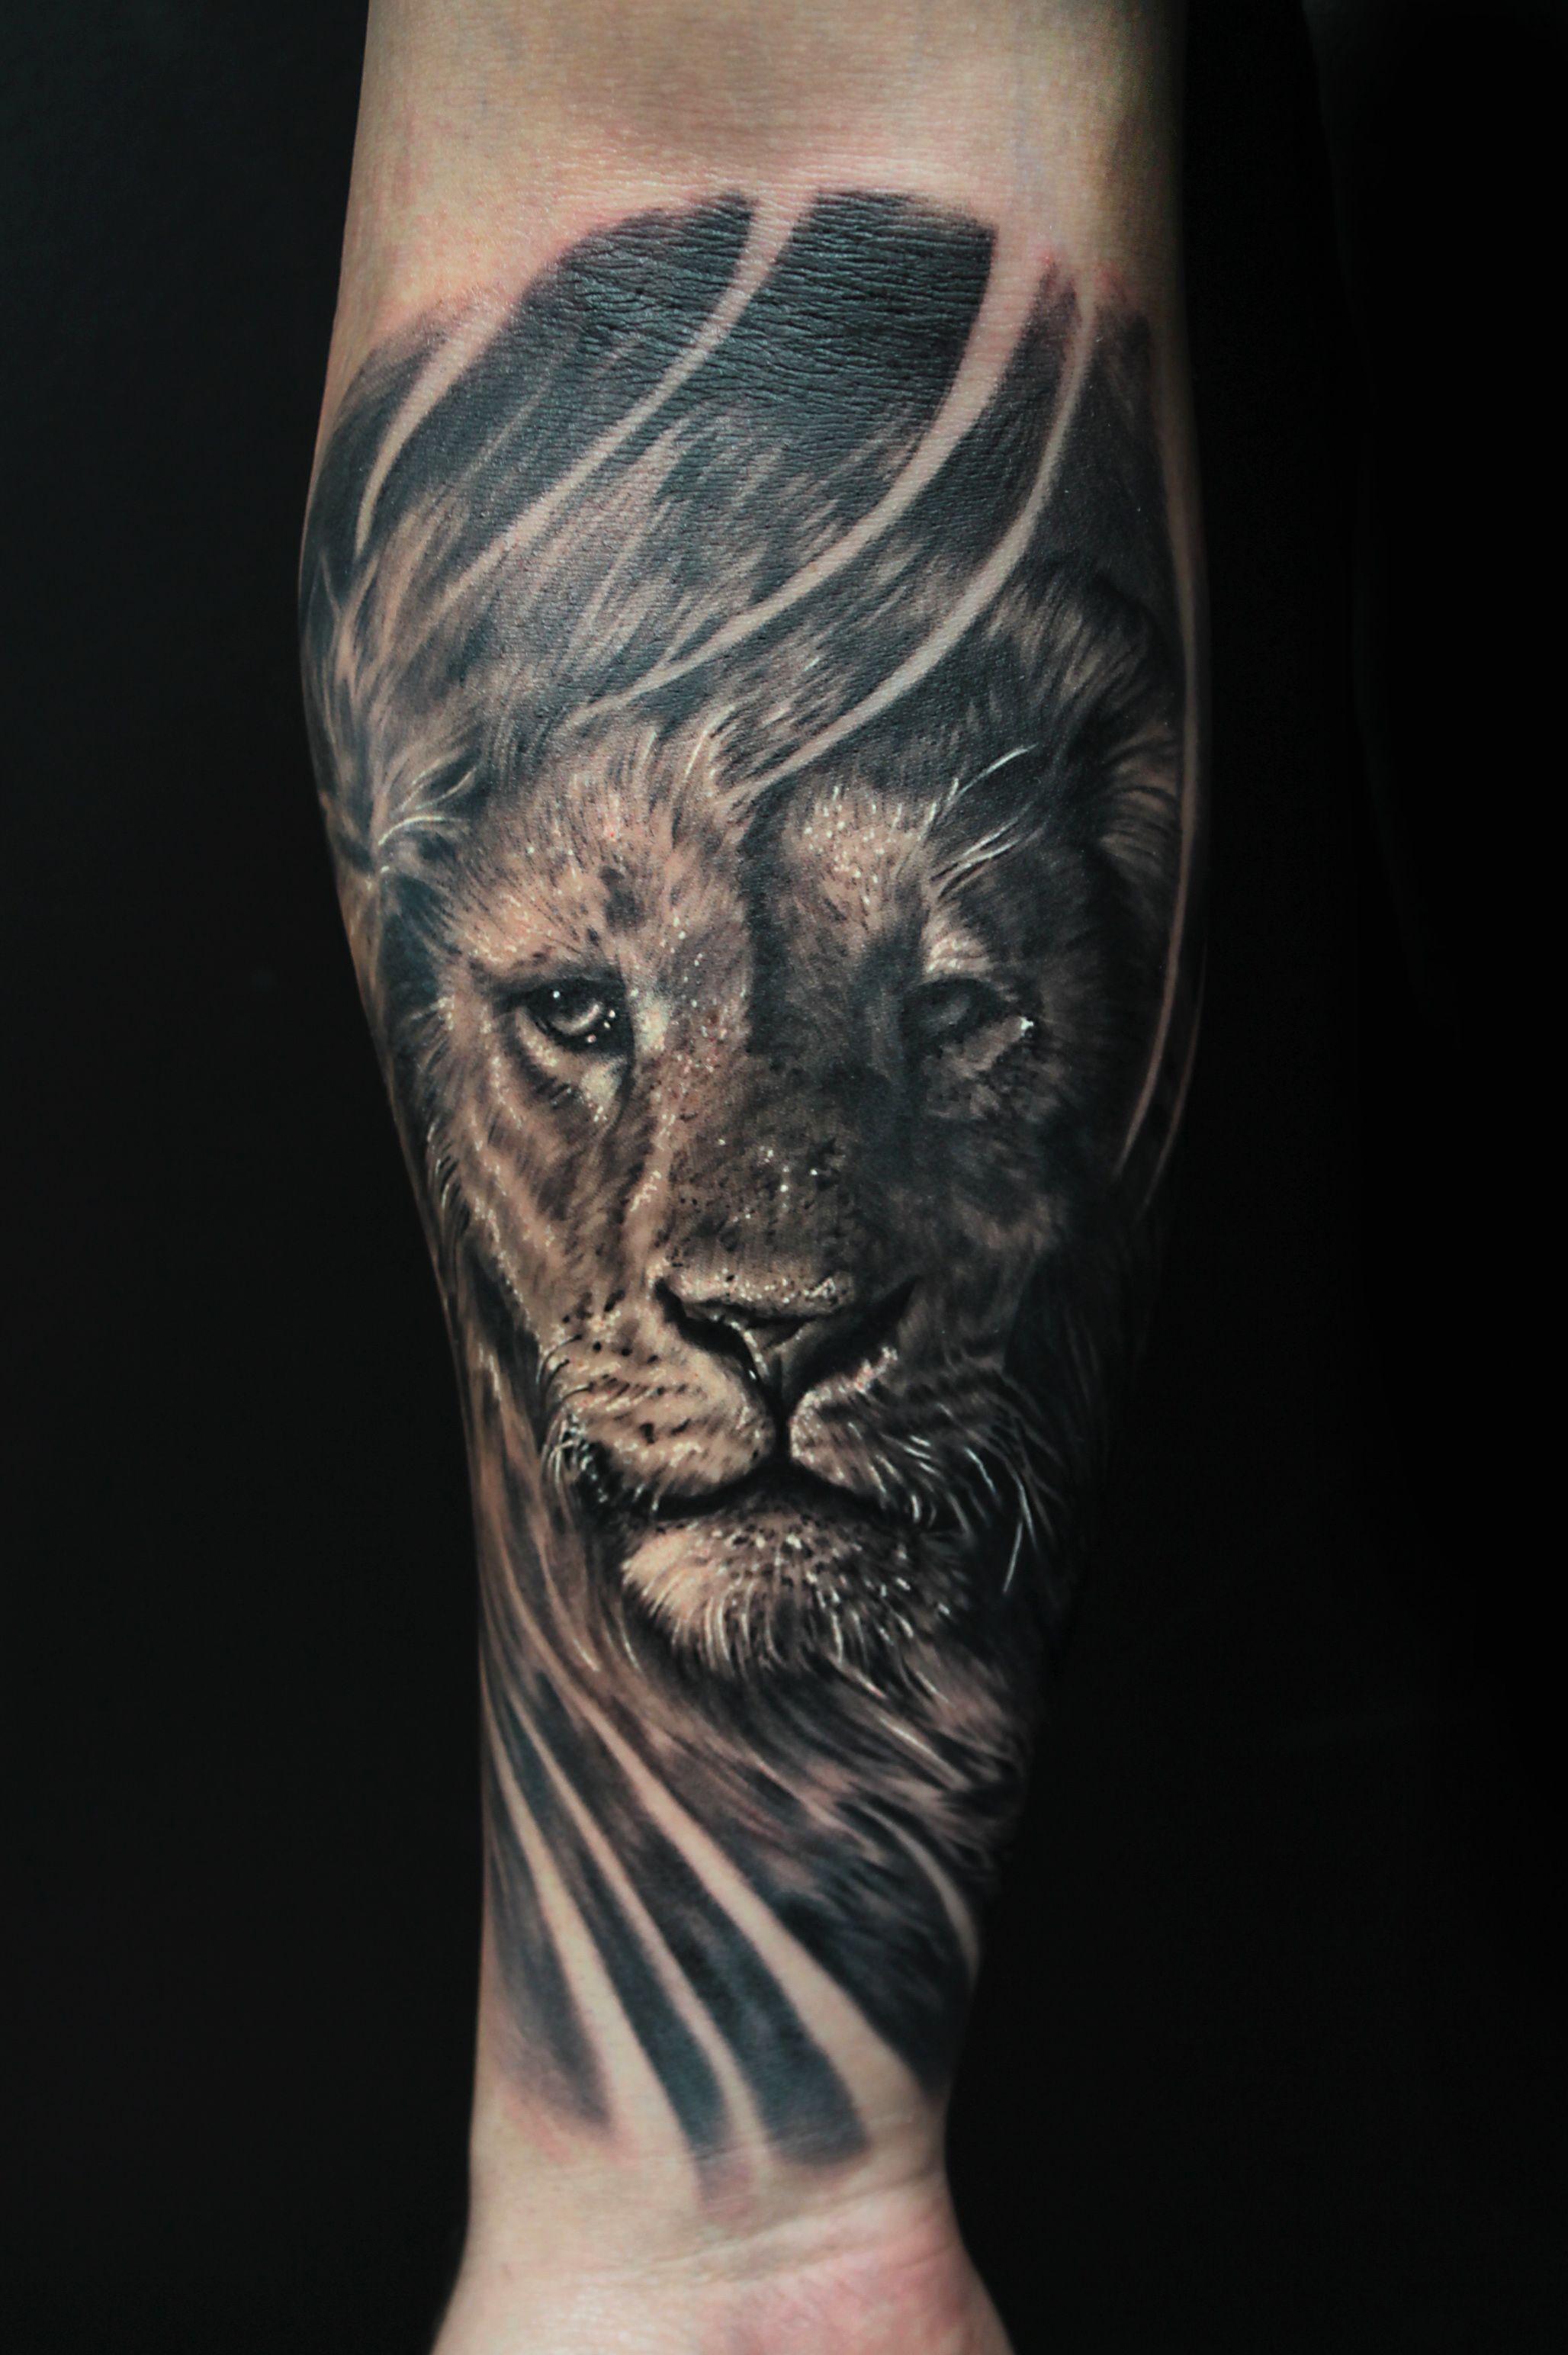 Lion Tattoo Forearm Google Zoeken Tatuirovka V Vide Lva Idei Dlya Tatuirovok Lvy